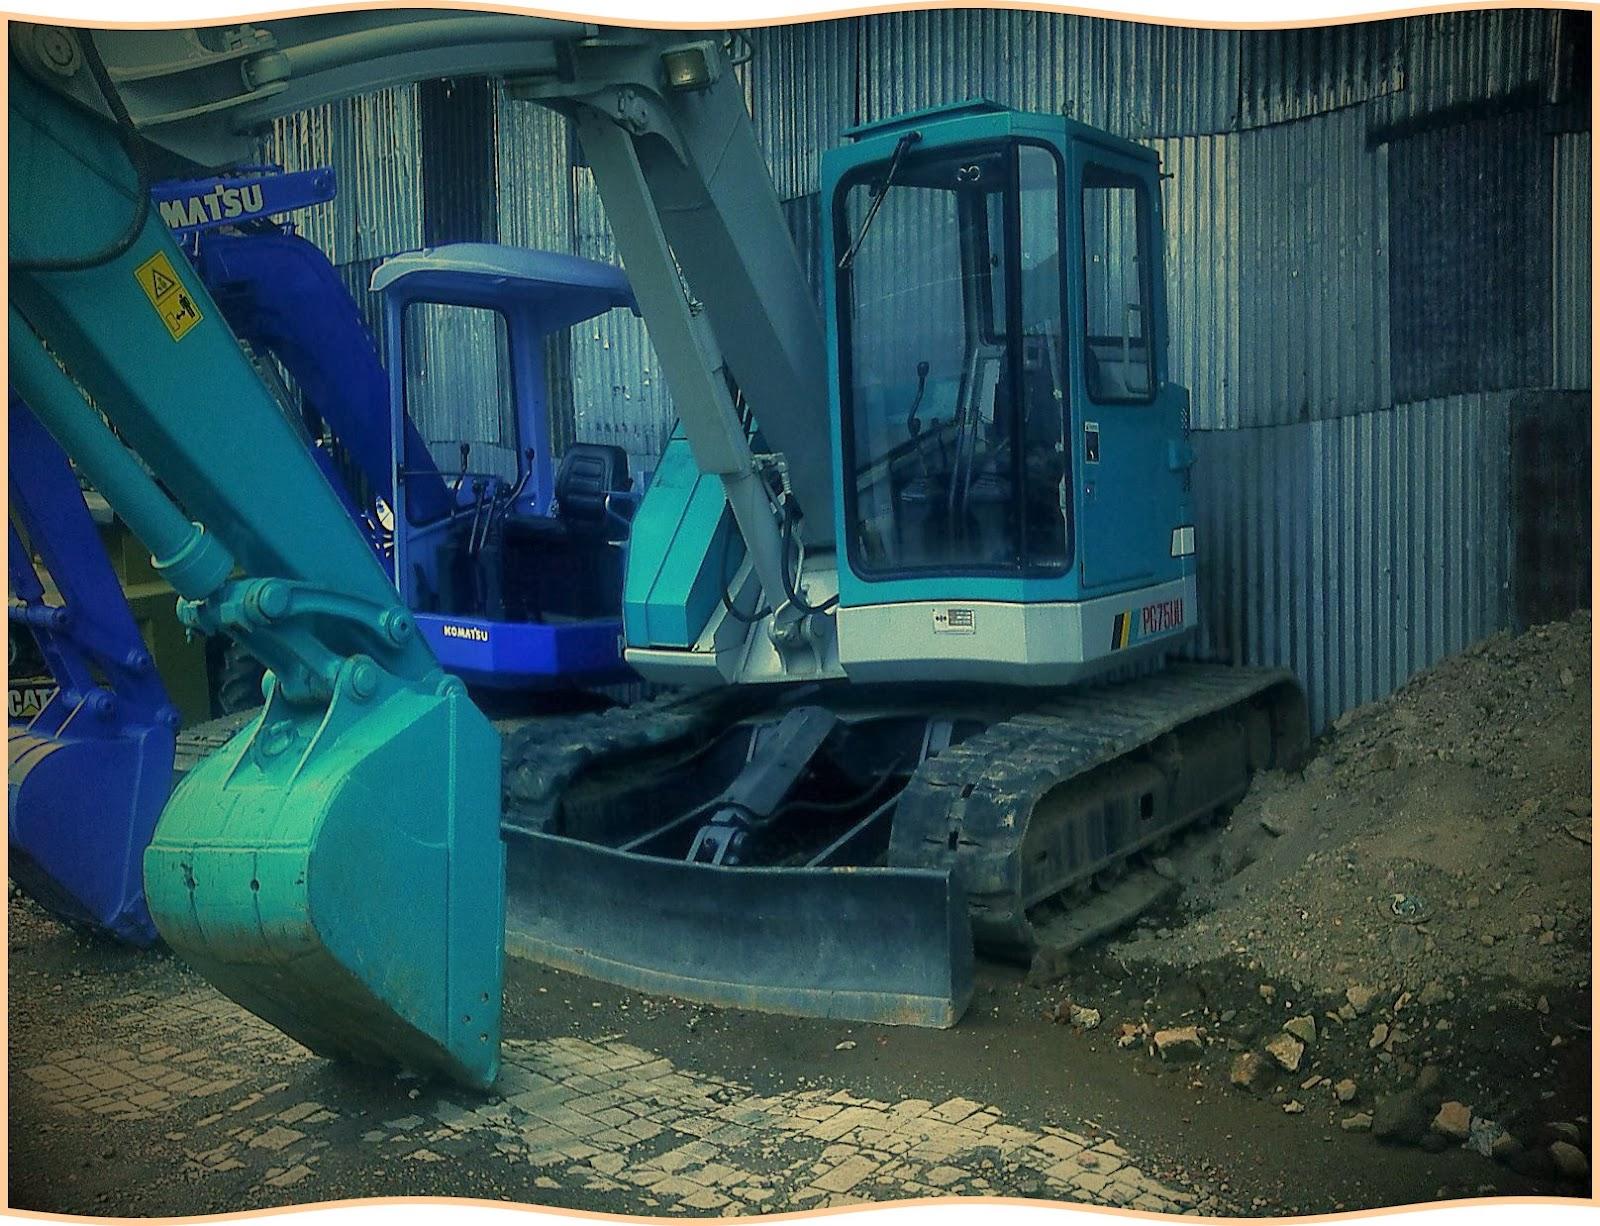 Bisnis Jual Alat Berat Bekas Stone Crusher Plant Bulldozer Bekas